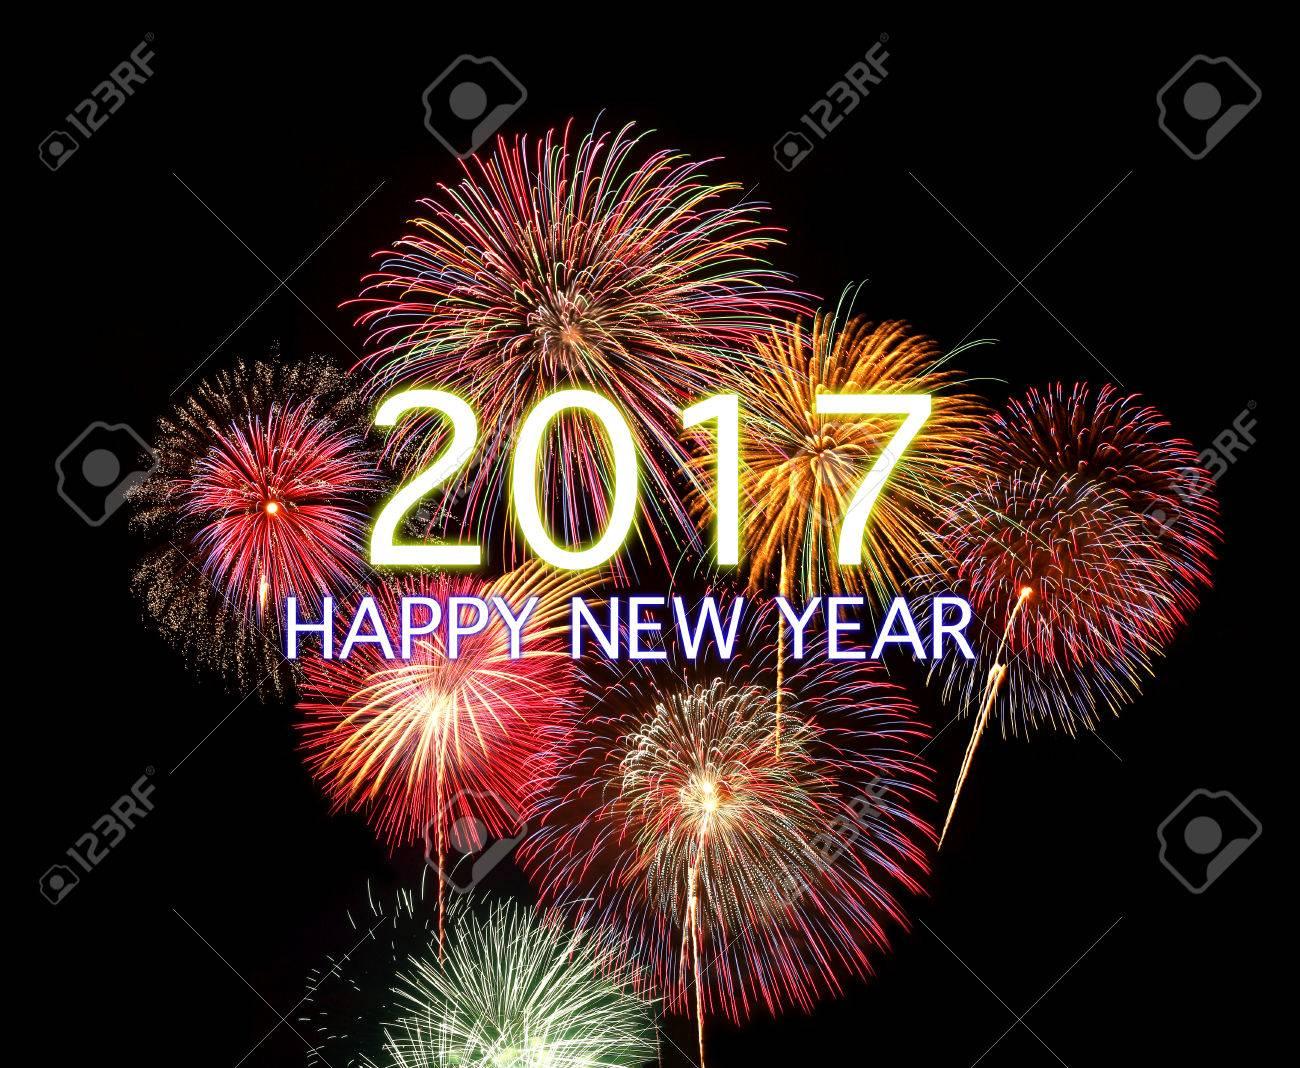 2017 HAPPY NEW YEAR - 65590588